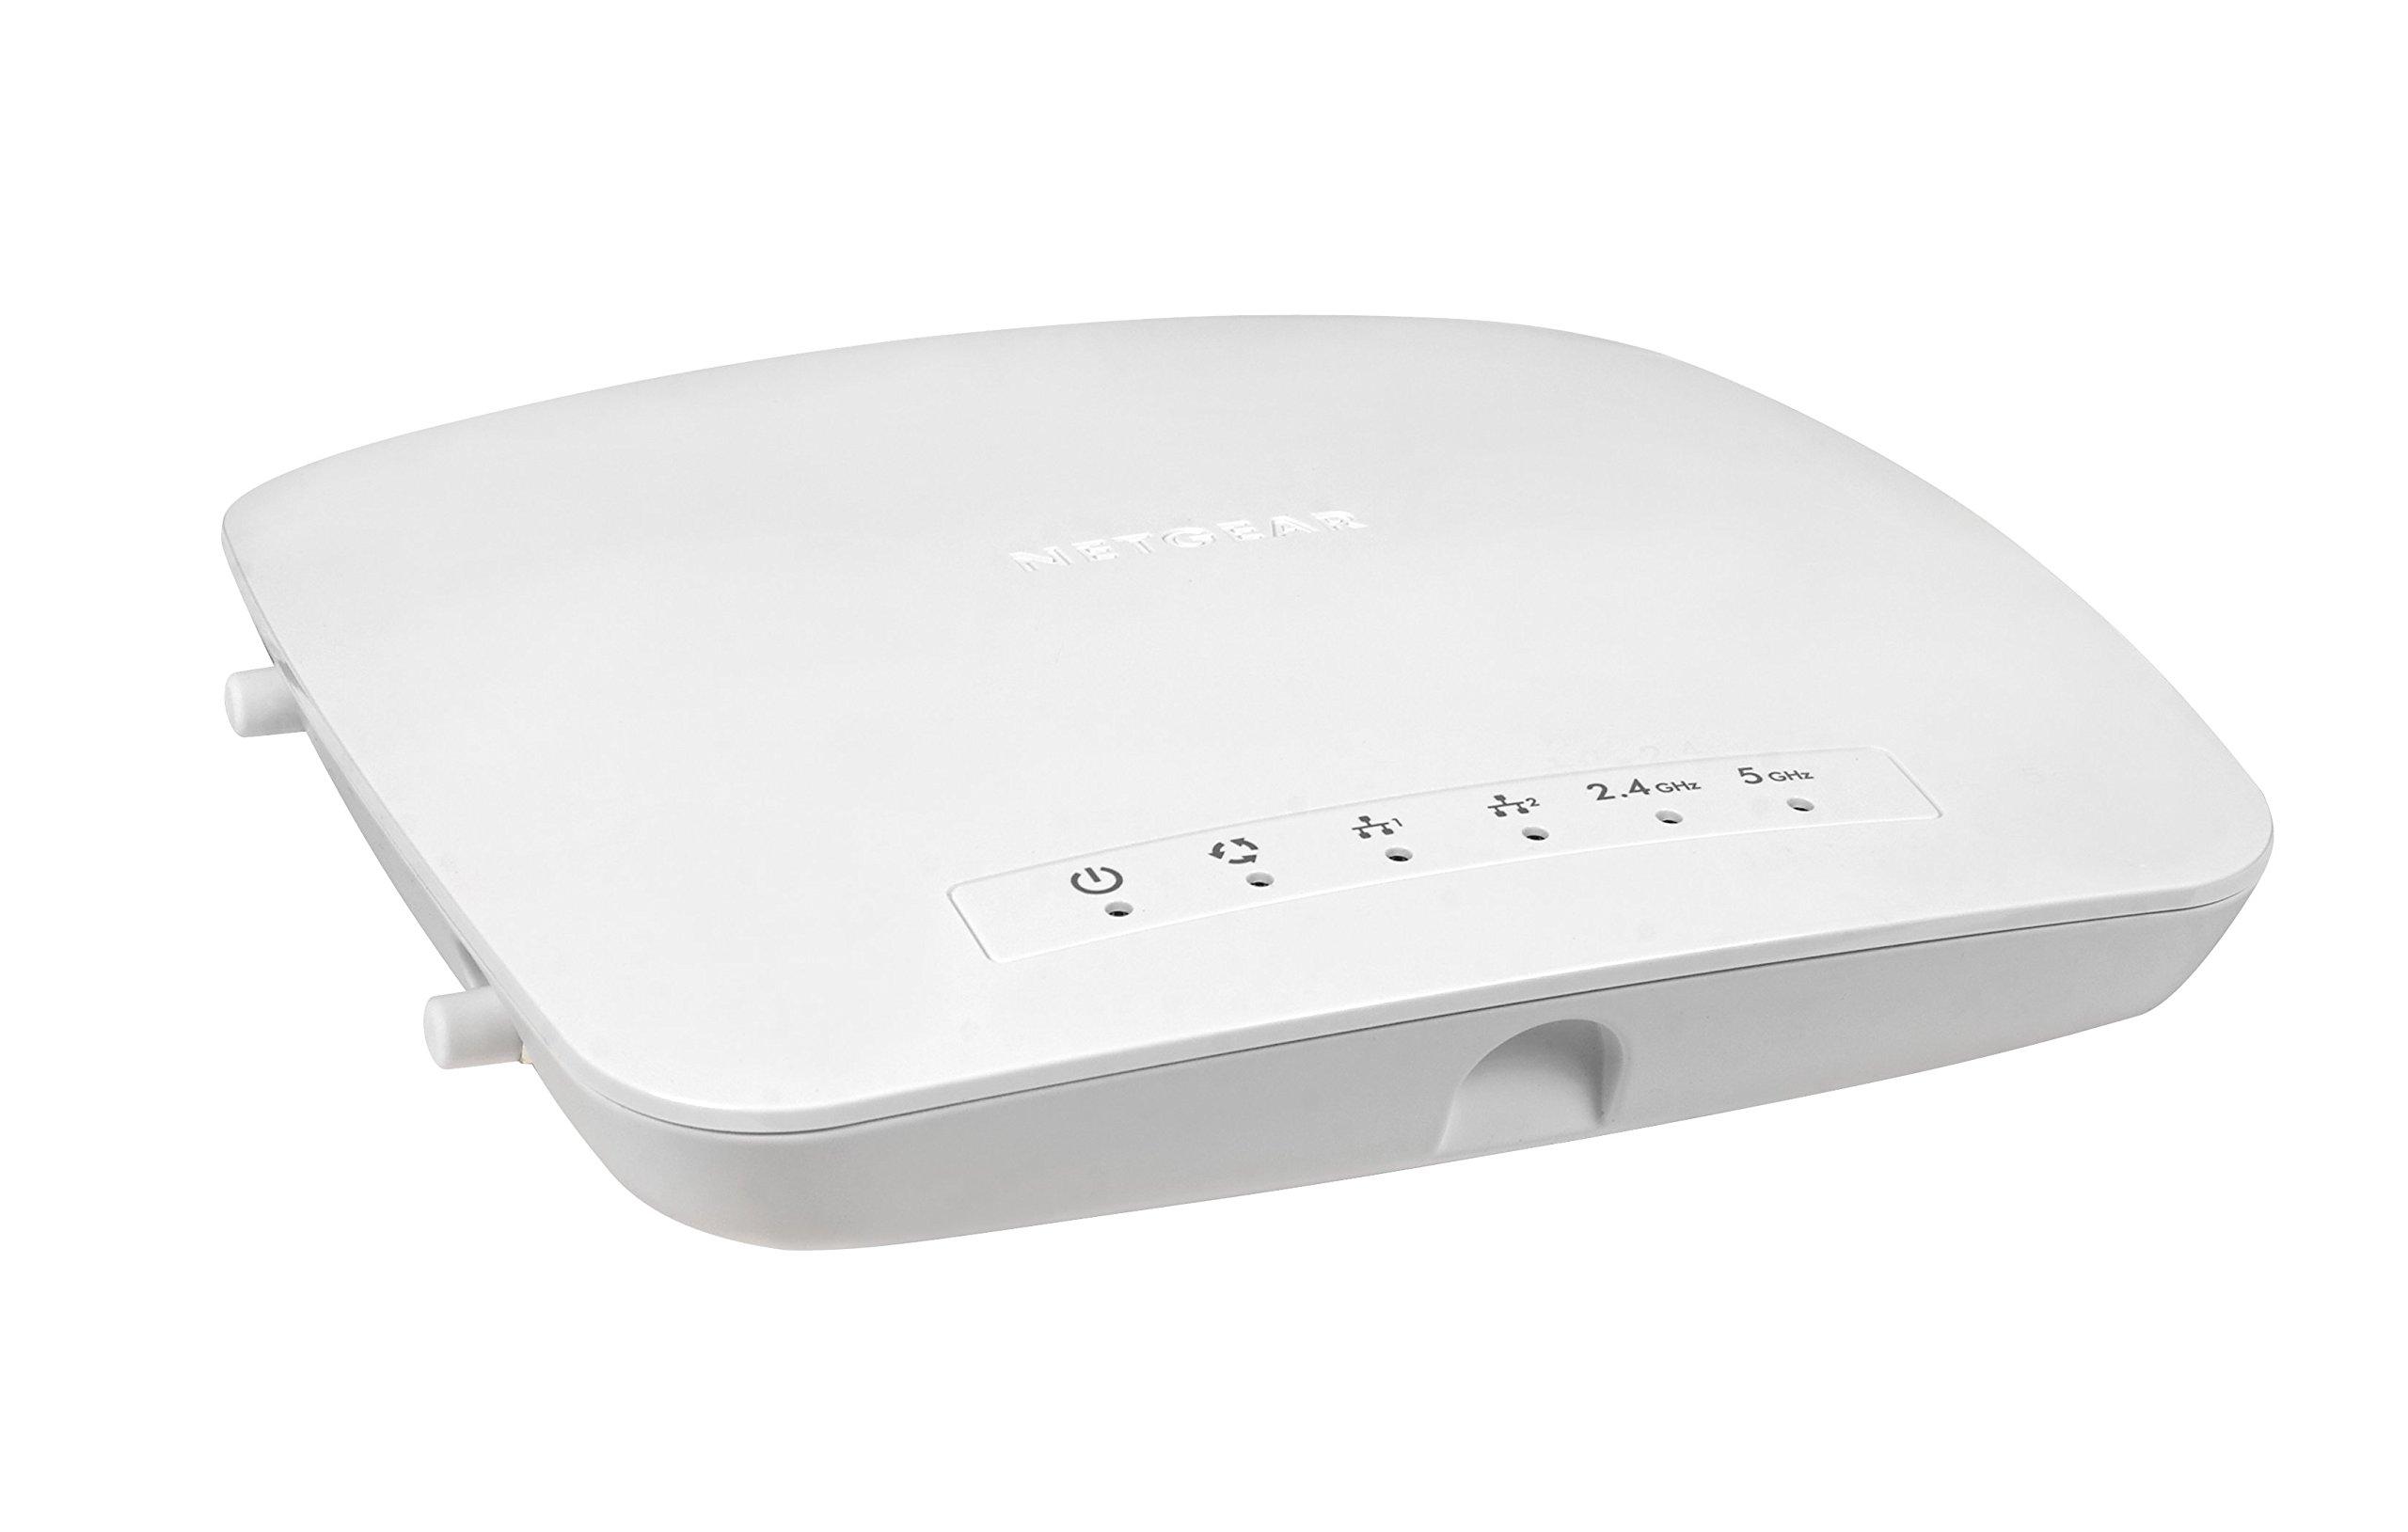 NETGEAR ProSAFE Premium 4x4 802.11ac Wave 2 Wireless Access Point (WAC740-100NAS) by NETGEAR